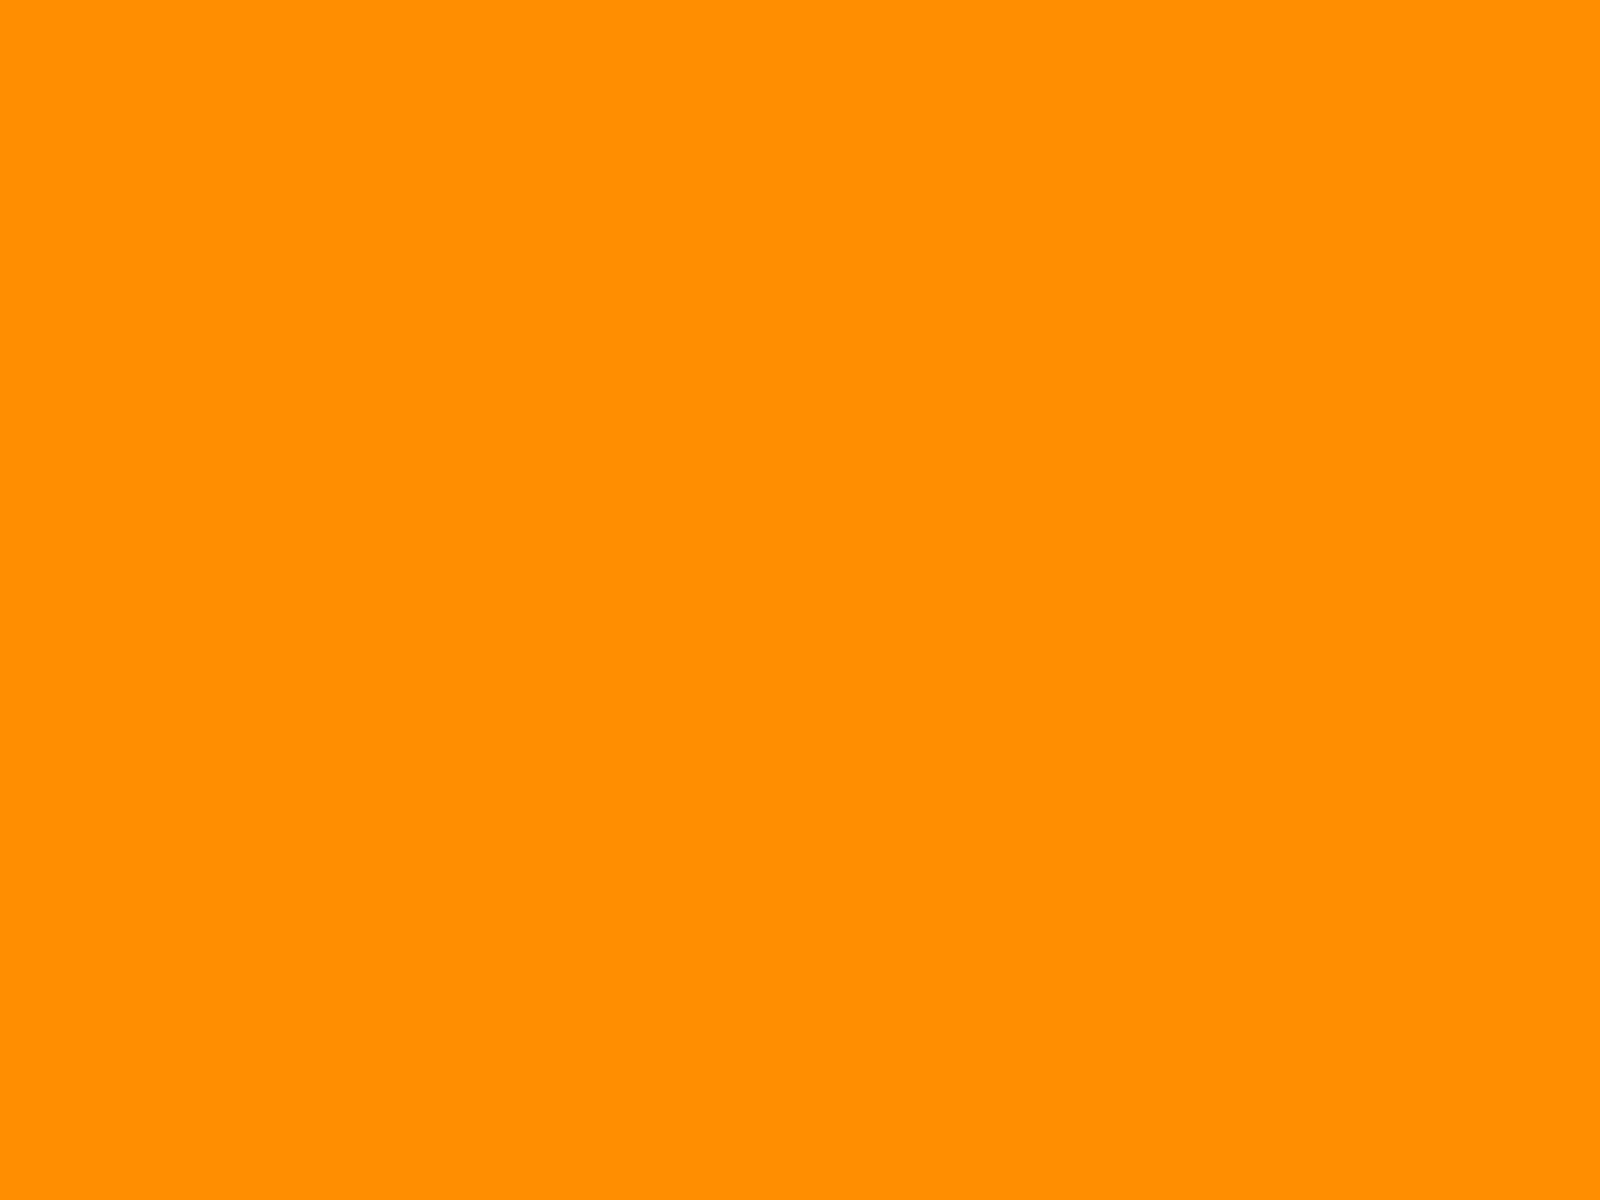 1600x1200 Princeton Orange Solid Color Background